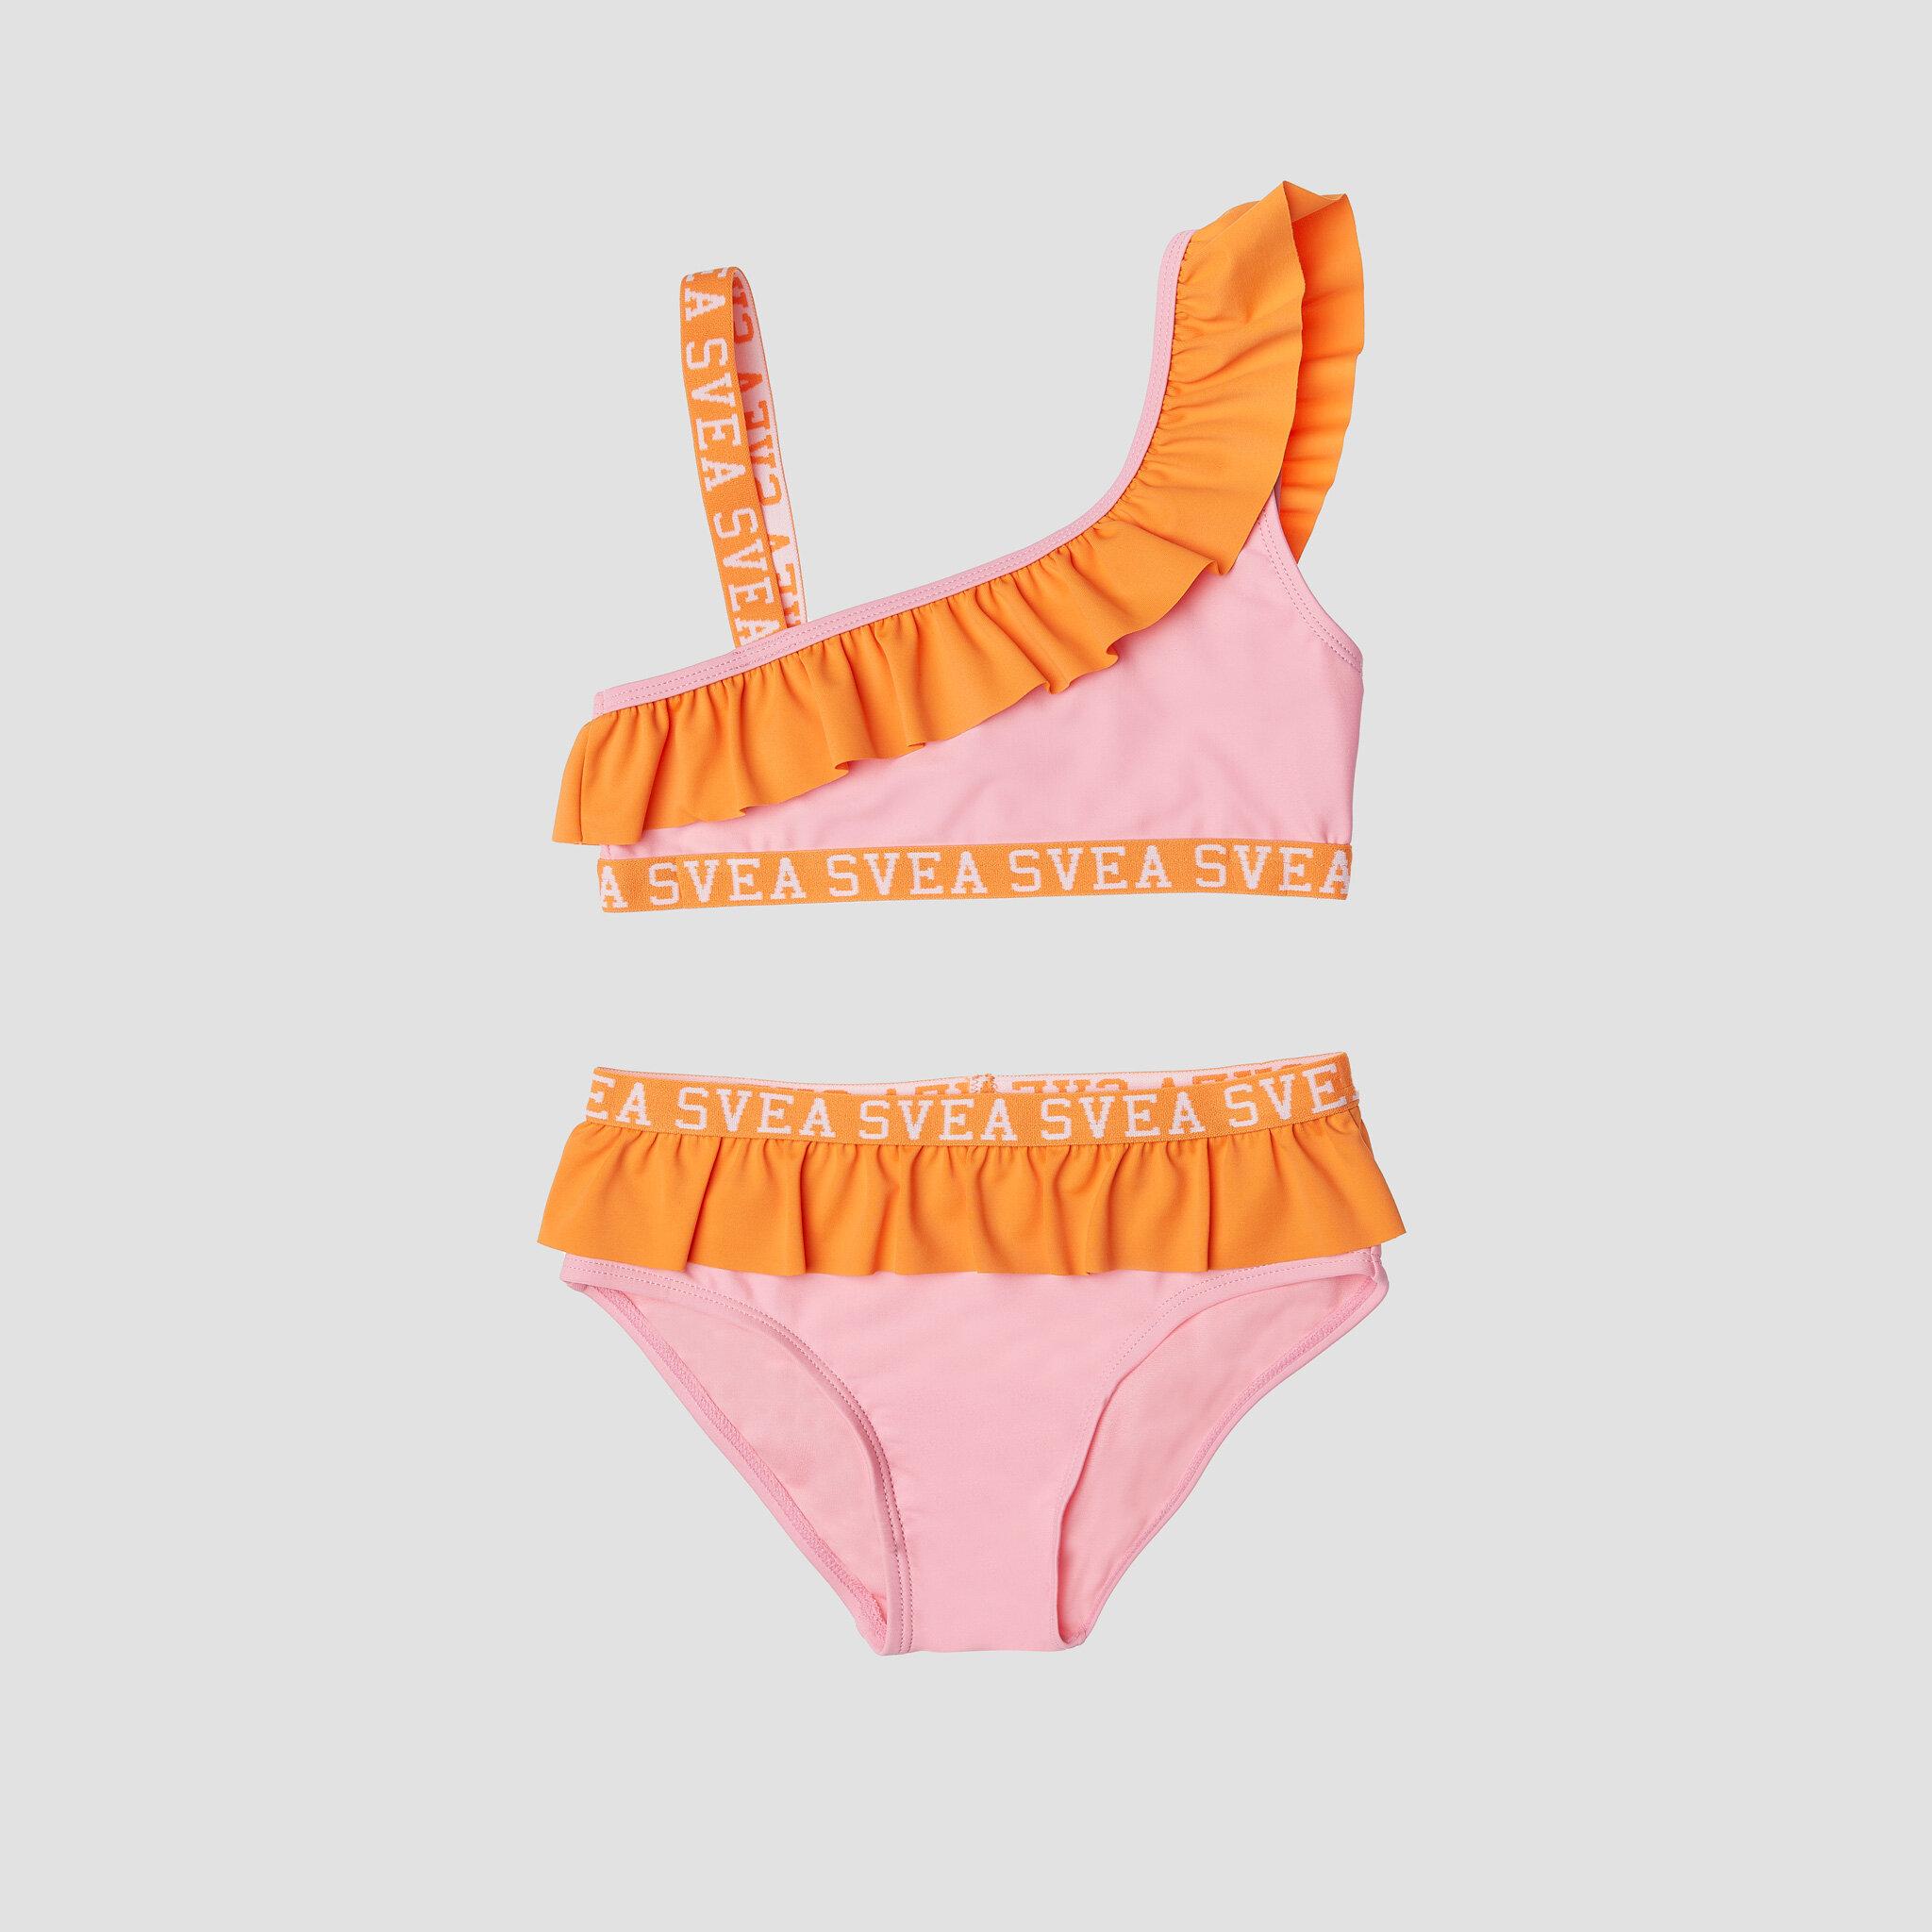 K. Frilly Off Shoulder Bikini